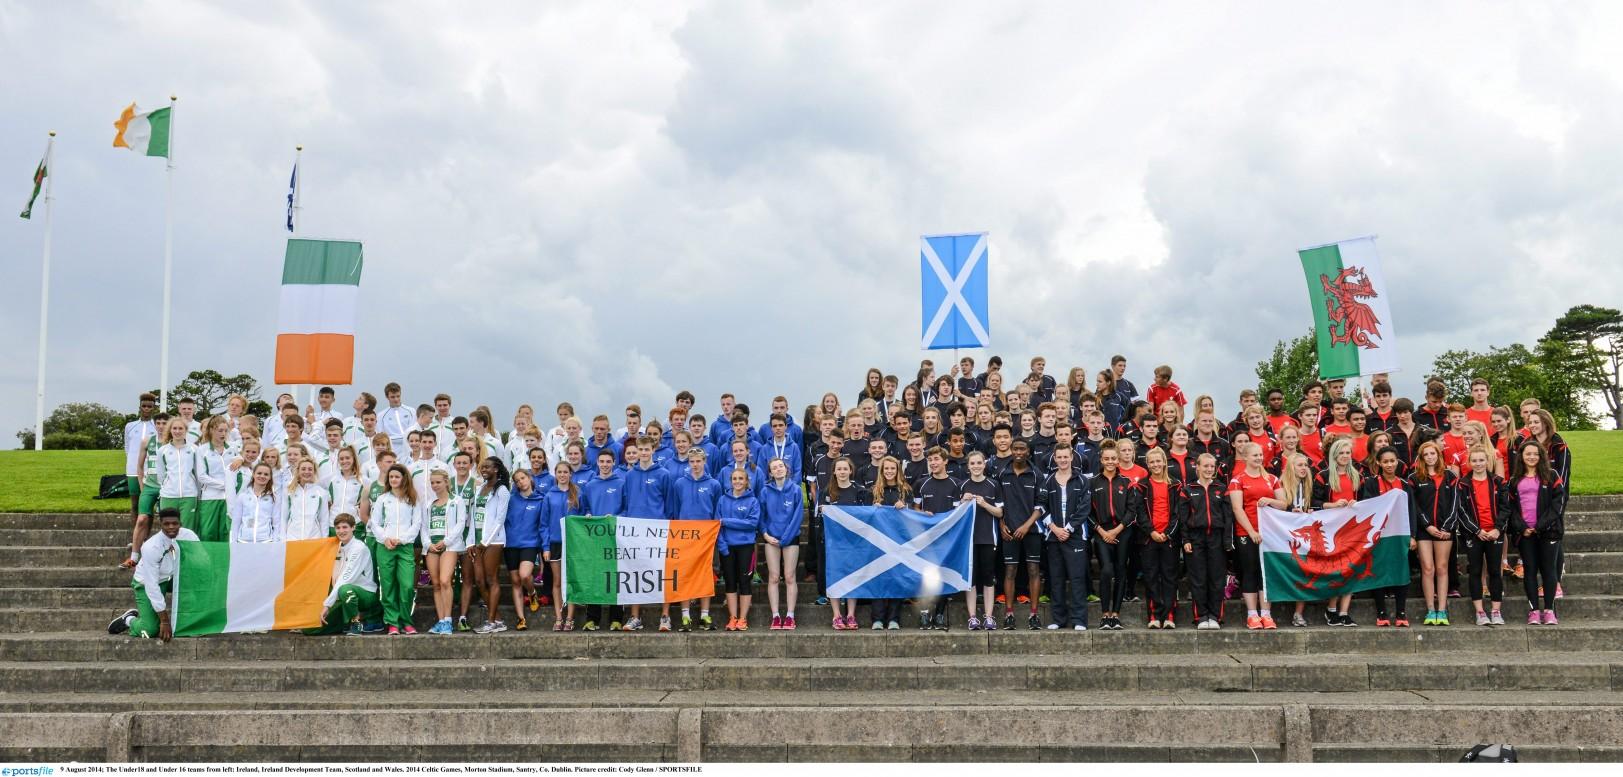 Celtic Games Team Announced 2017